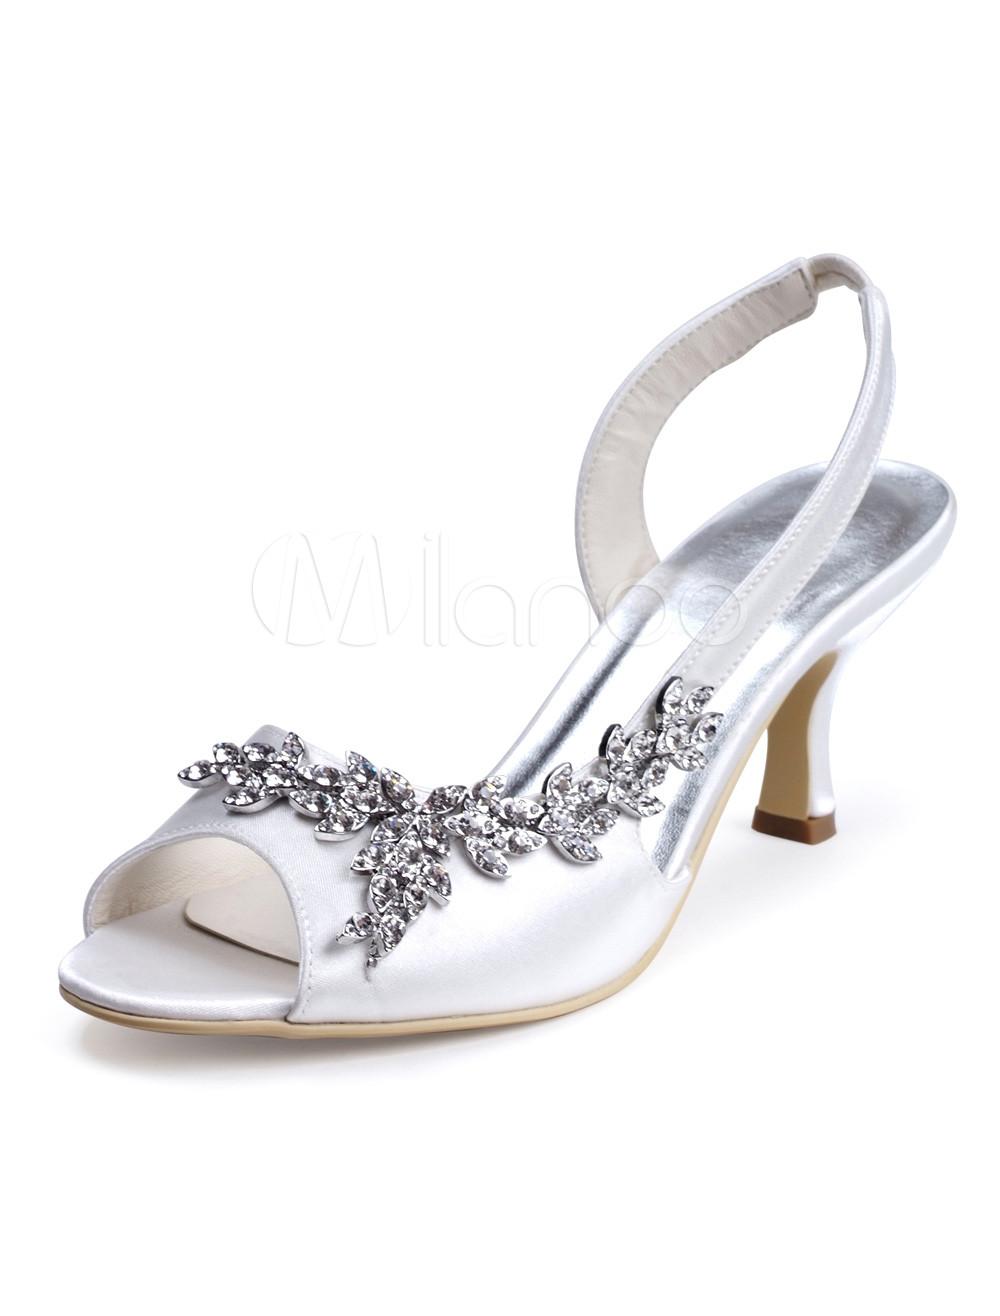 Sexy strass blanc écru talon aiguille soie et Satin robe sandales